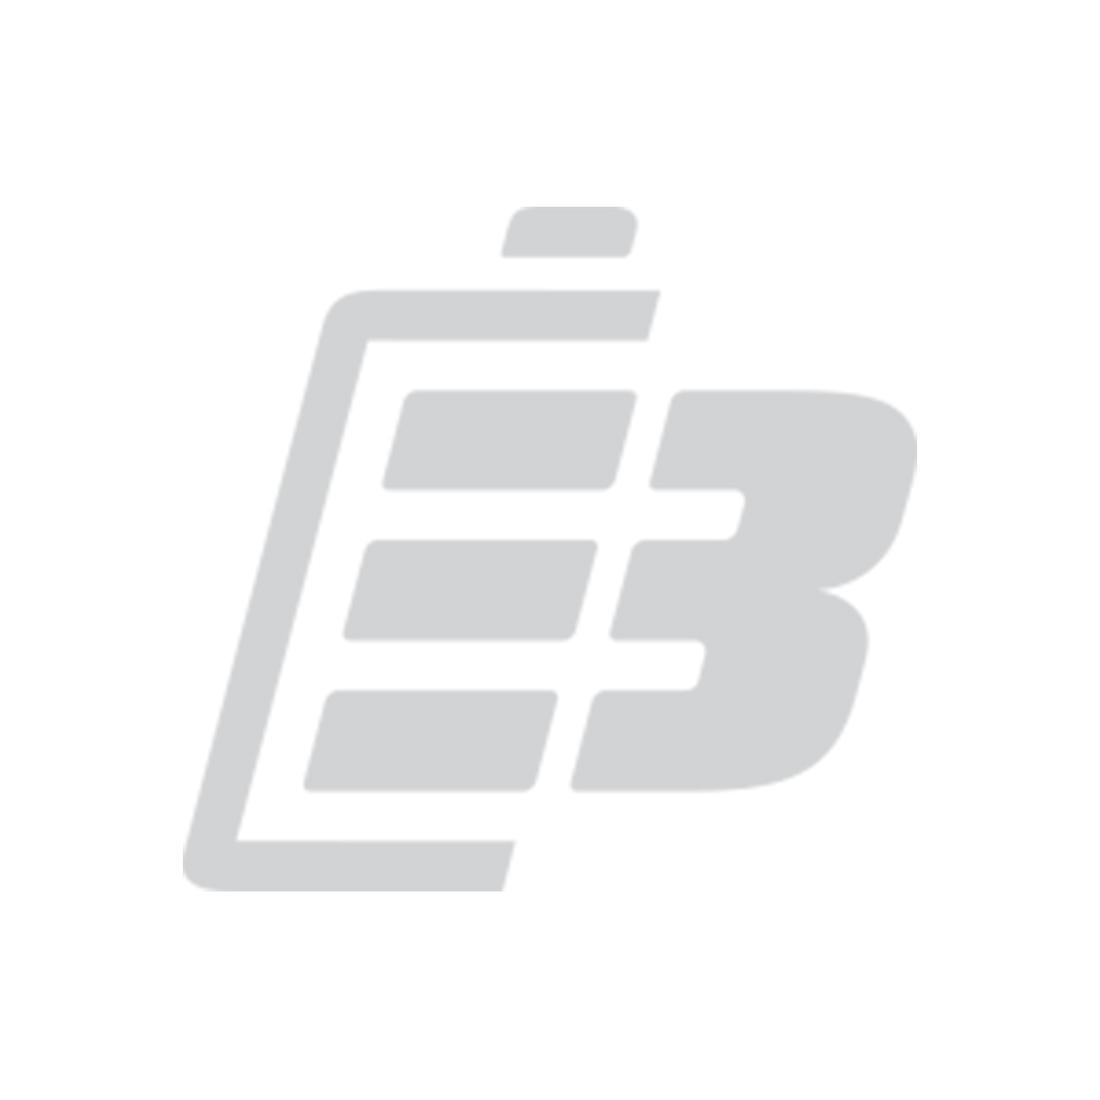 Cordless phone battery Philips Magic 2_1